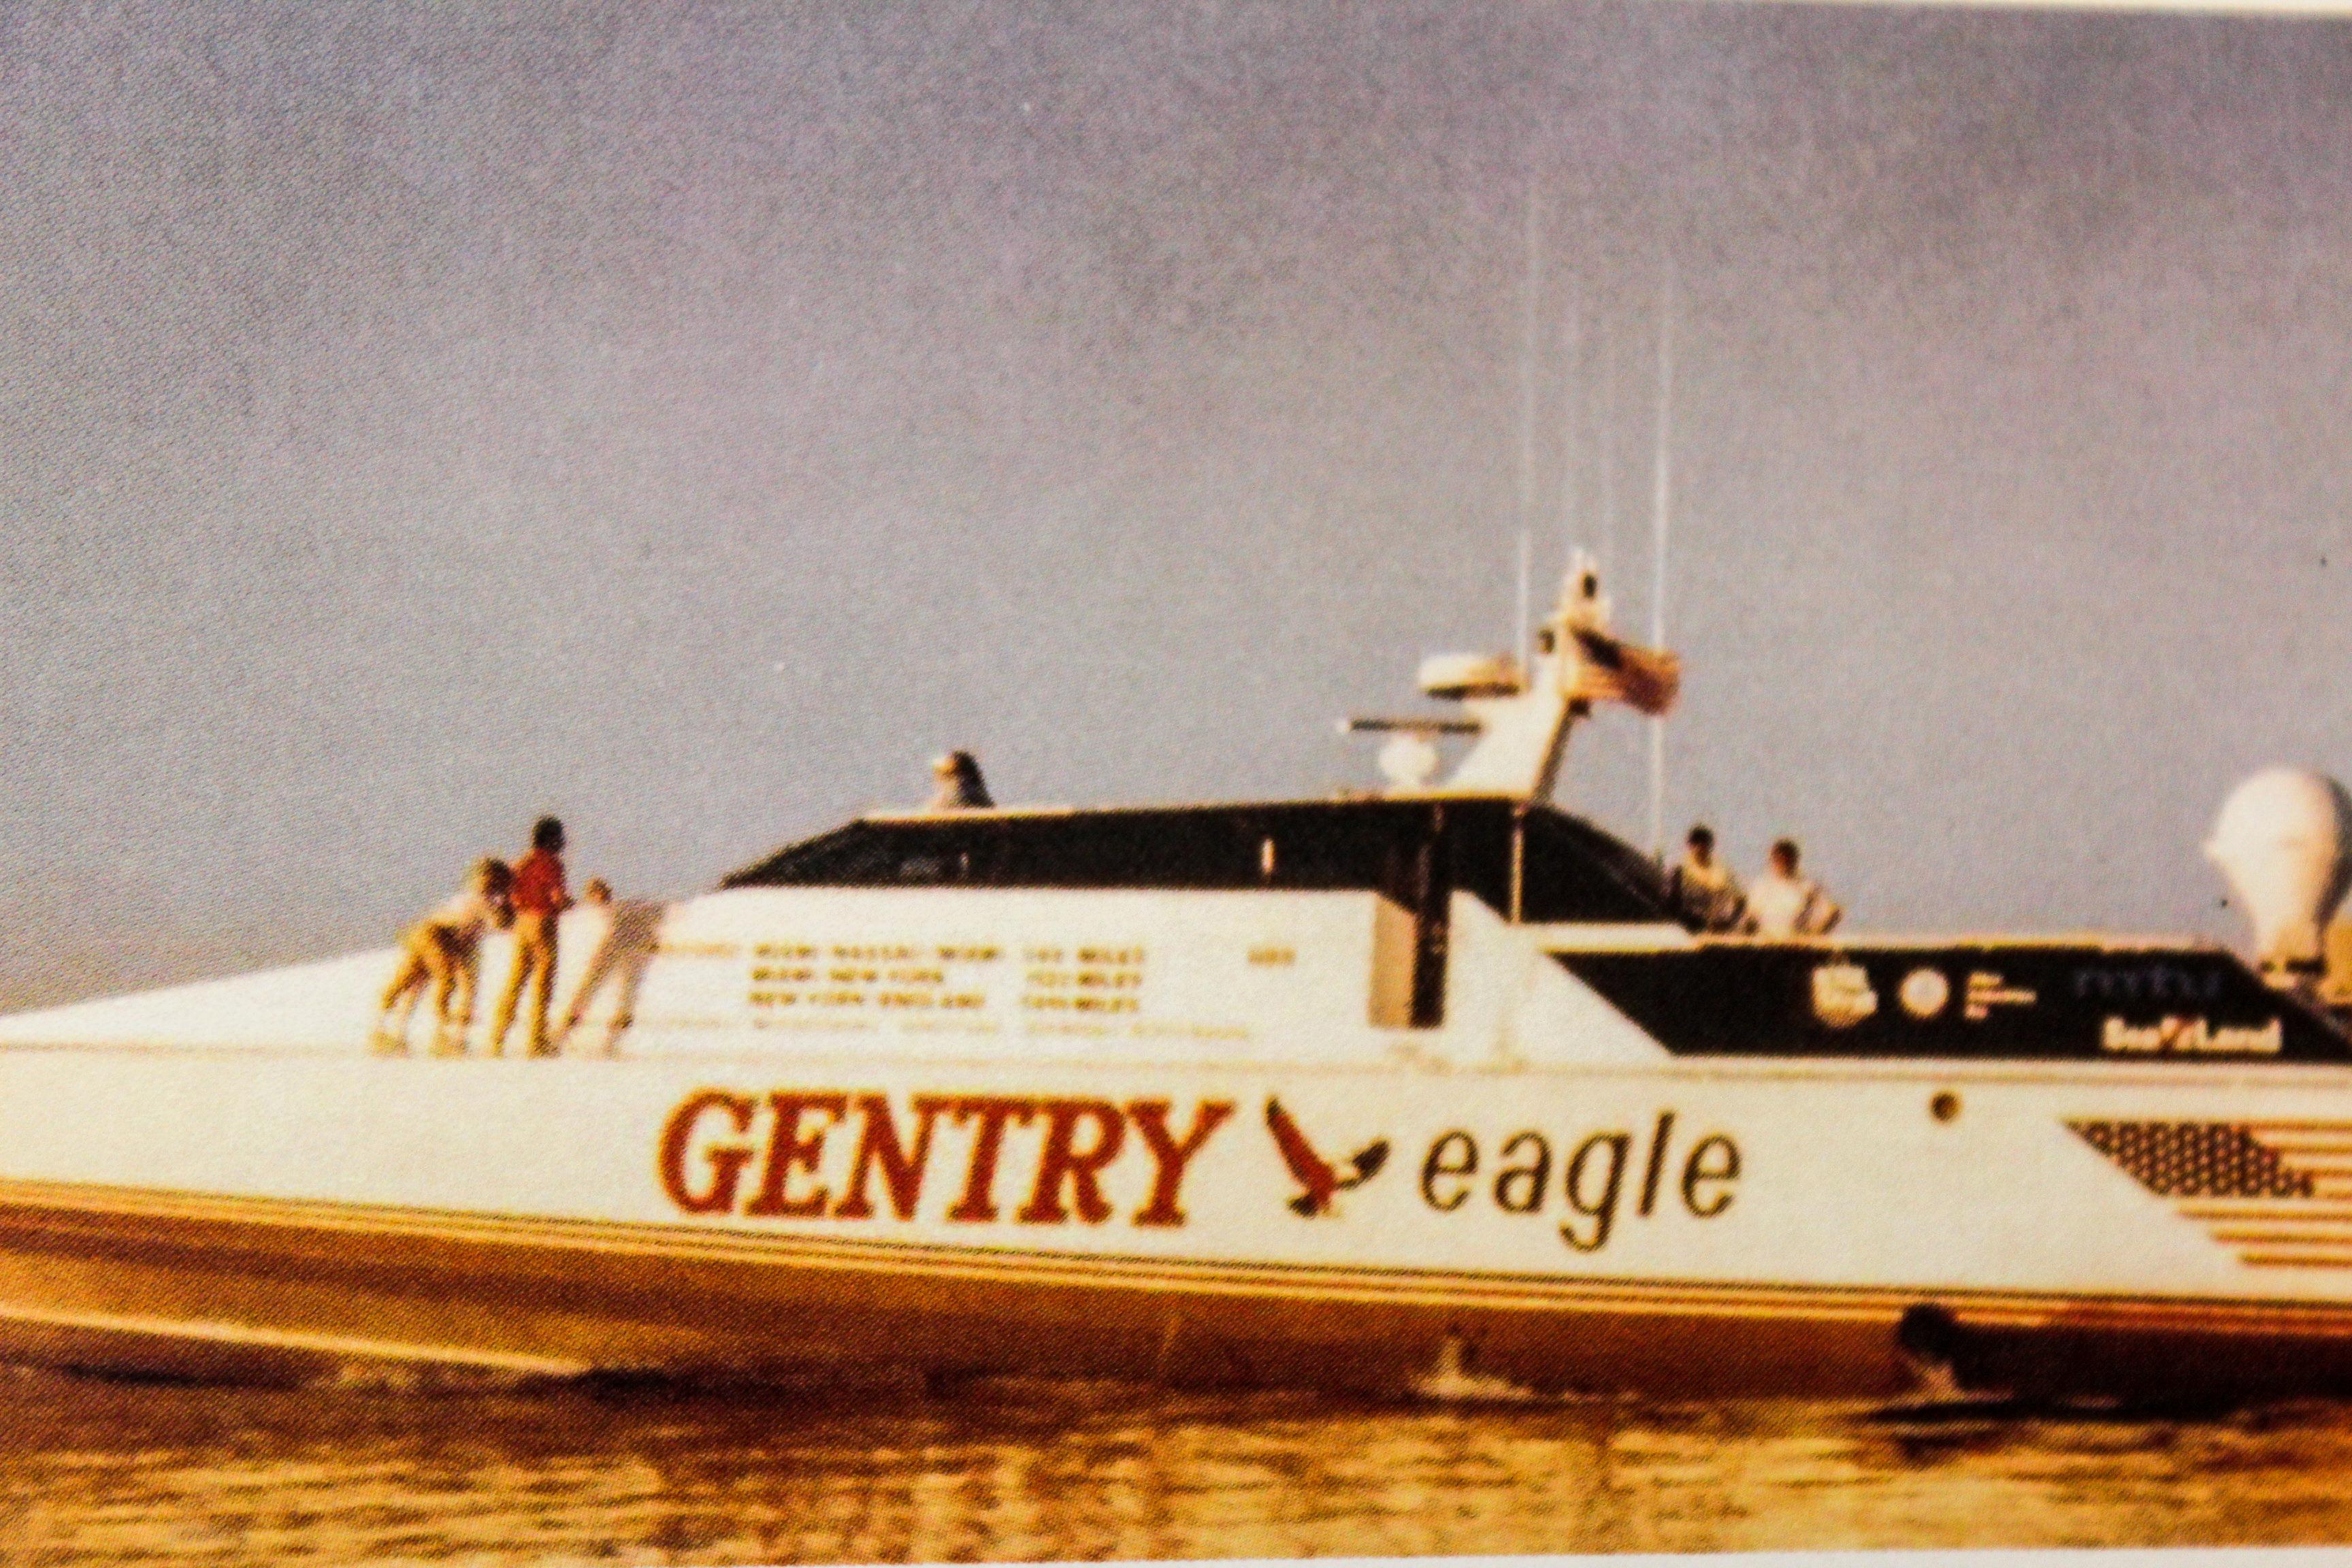 7 Gentry Eagle beast.jpg